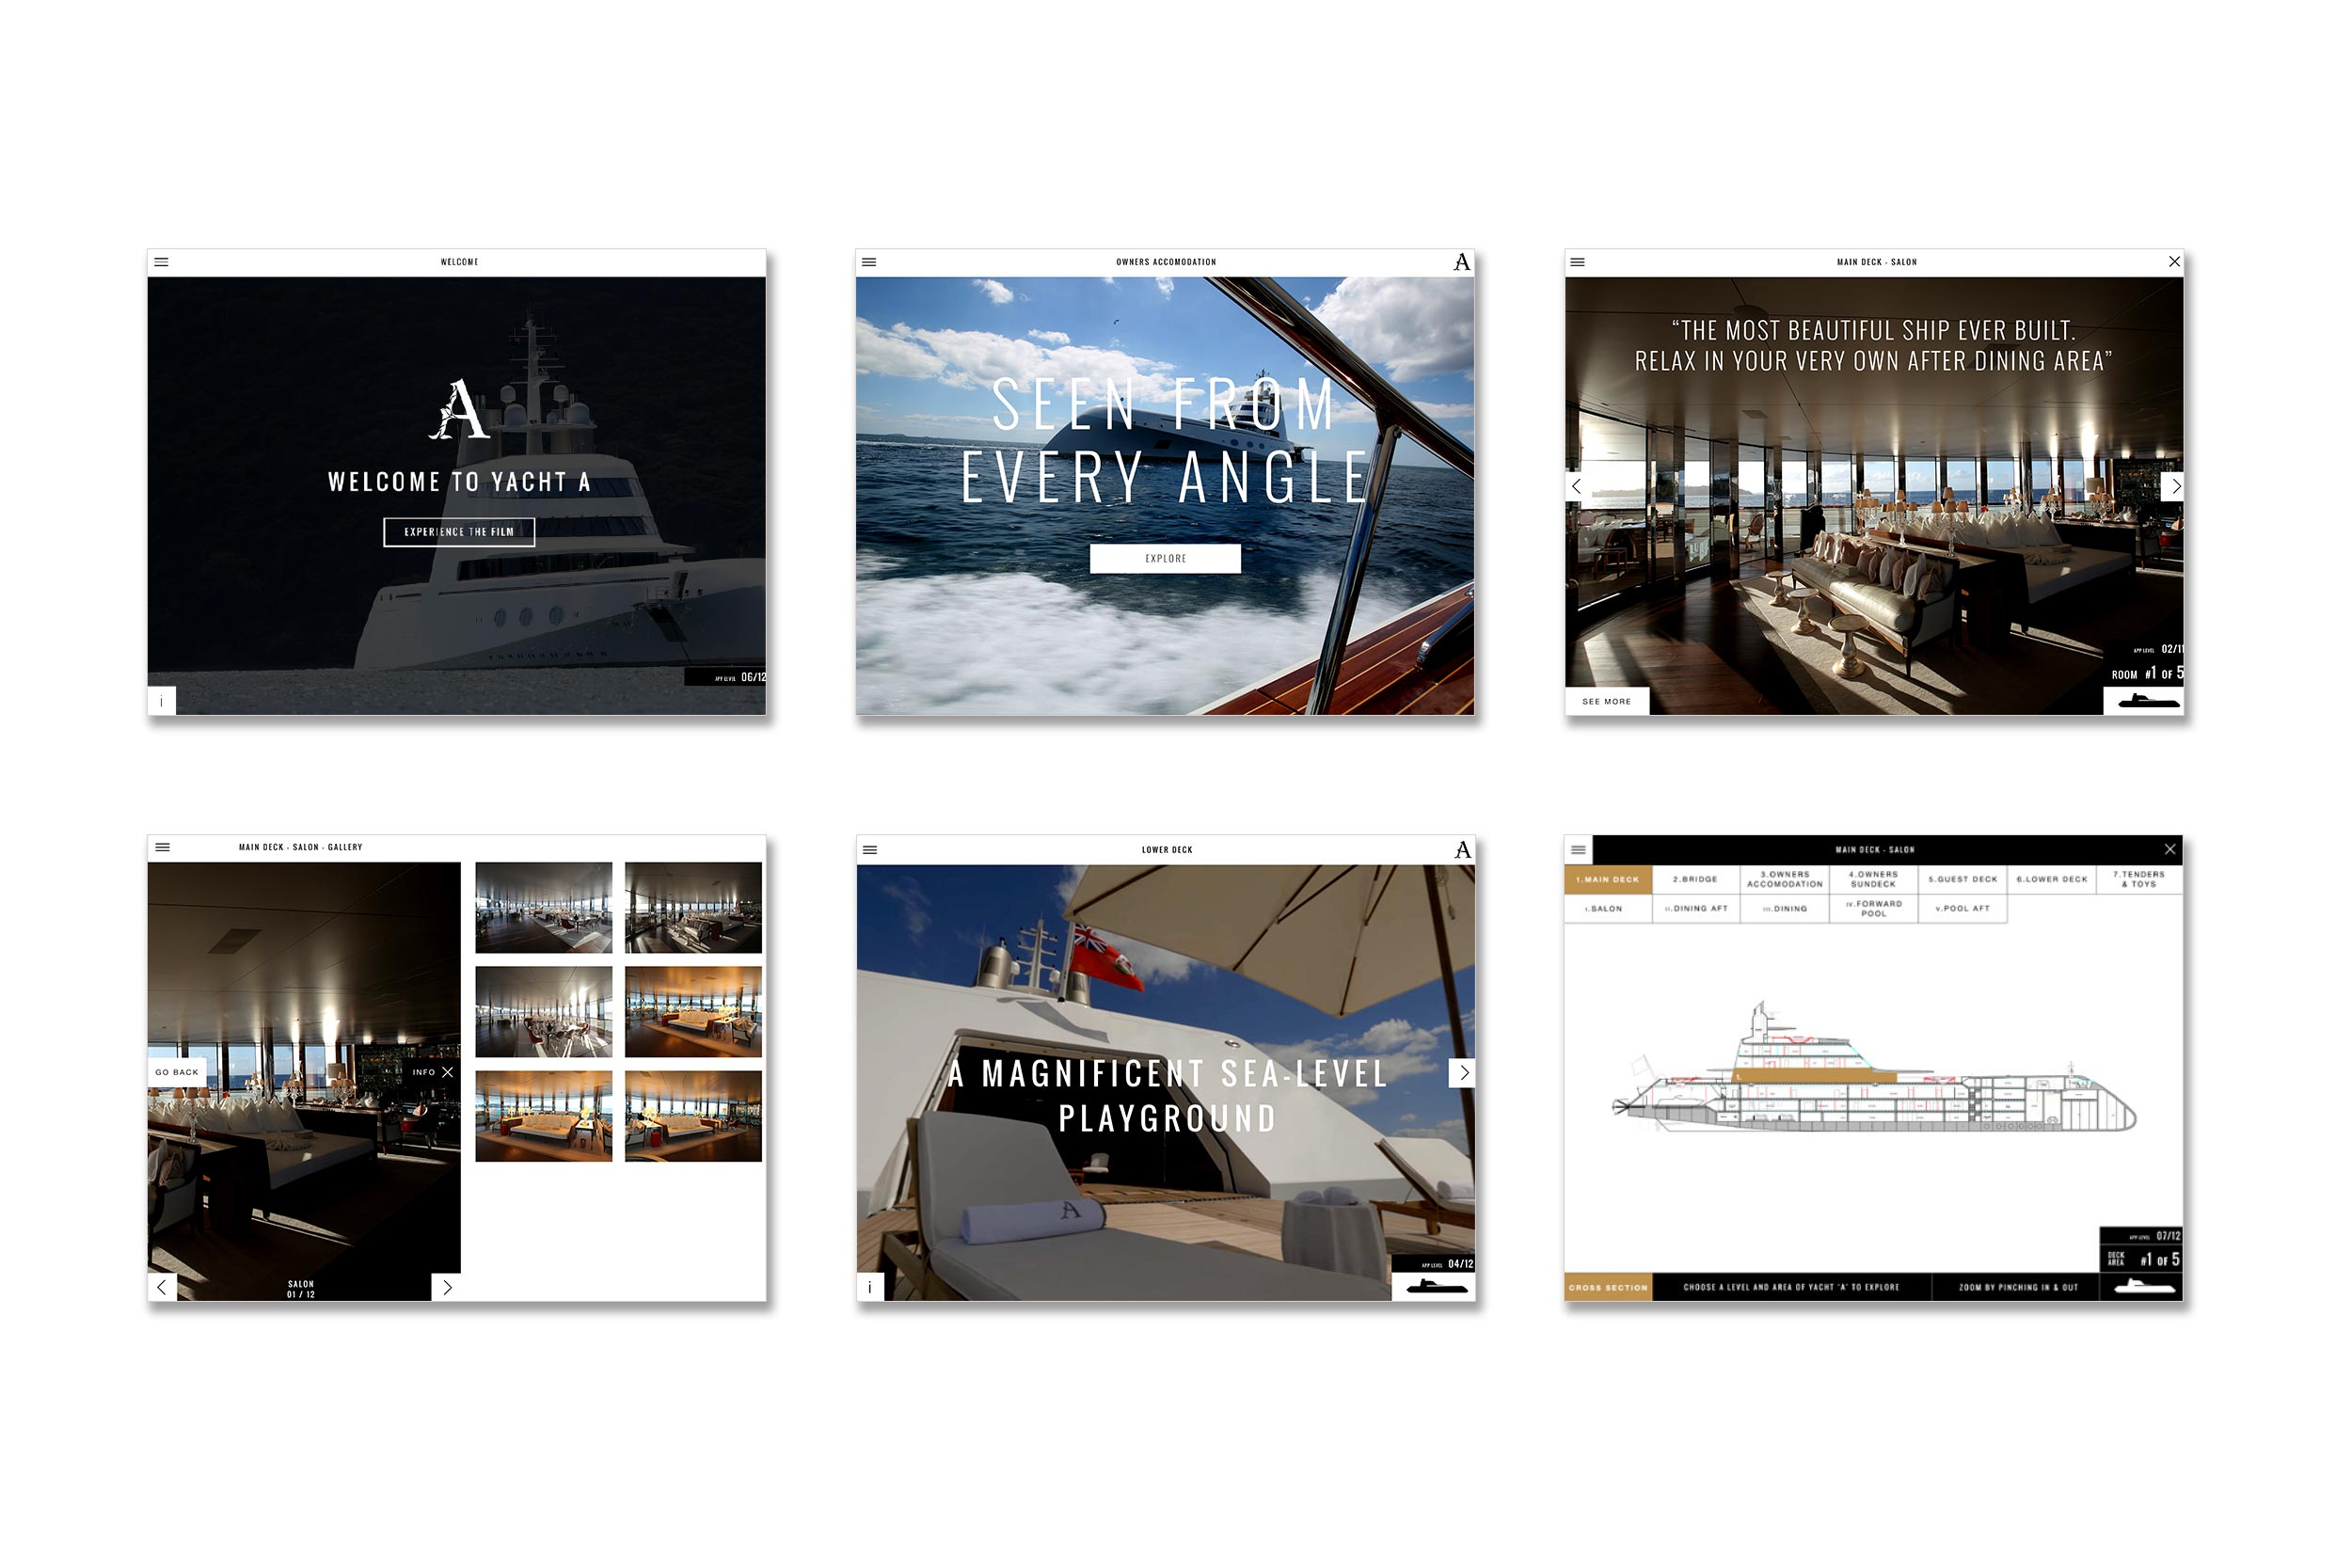 superyacht app screens